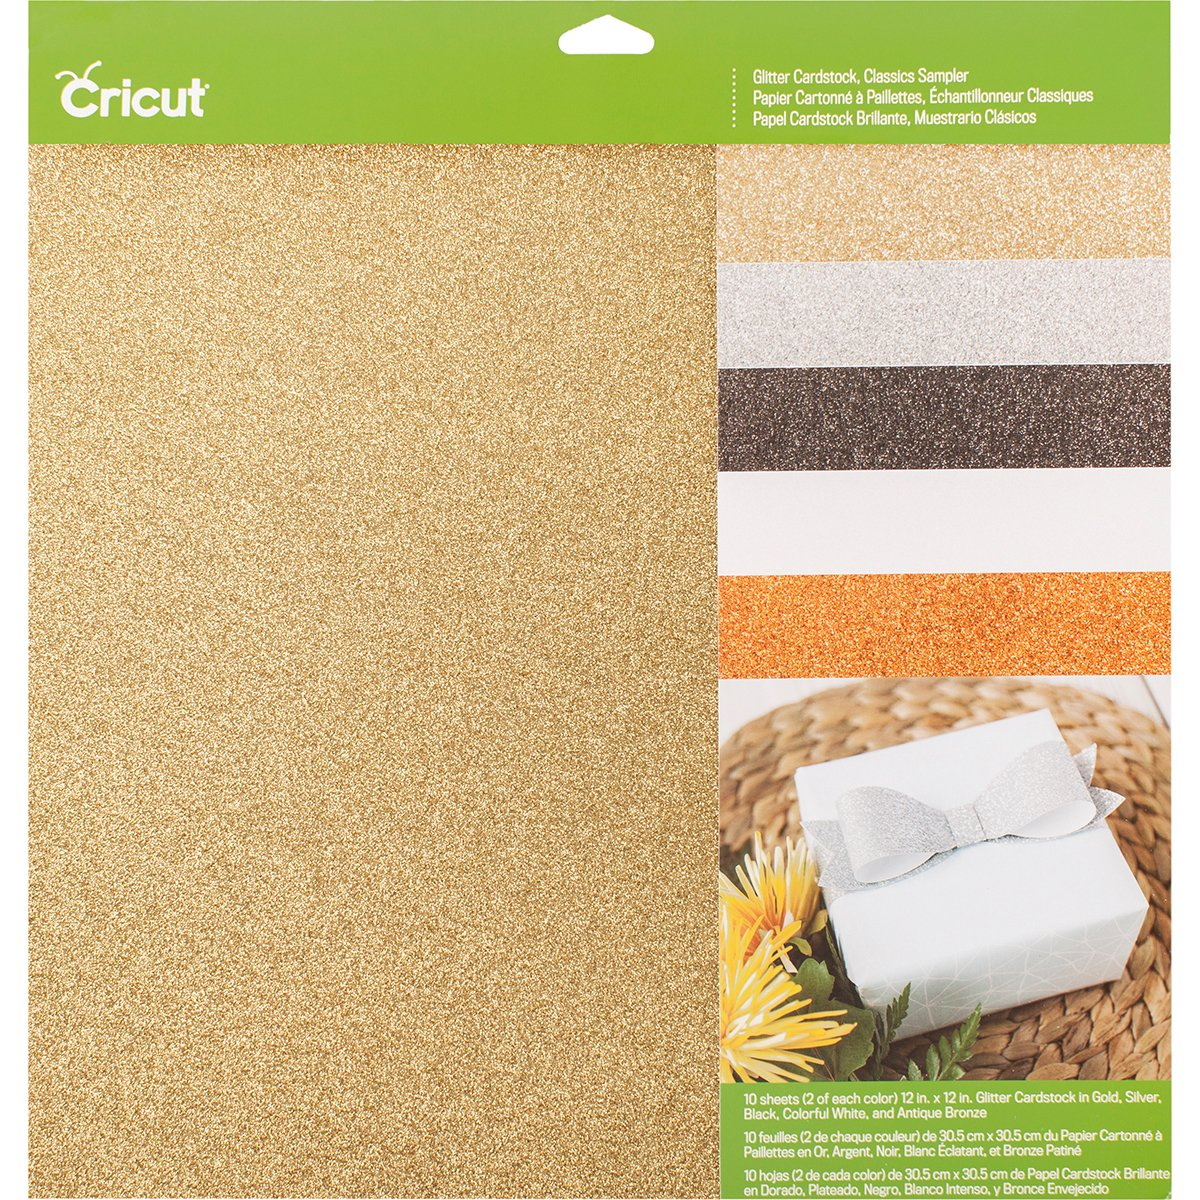 Cricut Paper & Cardstock - 12